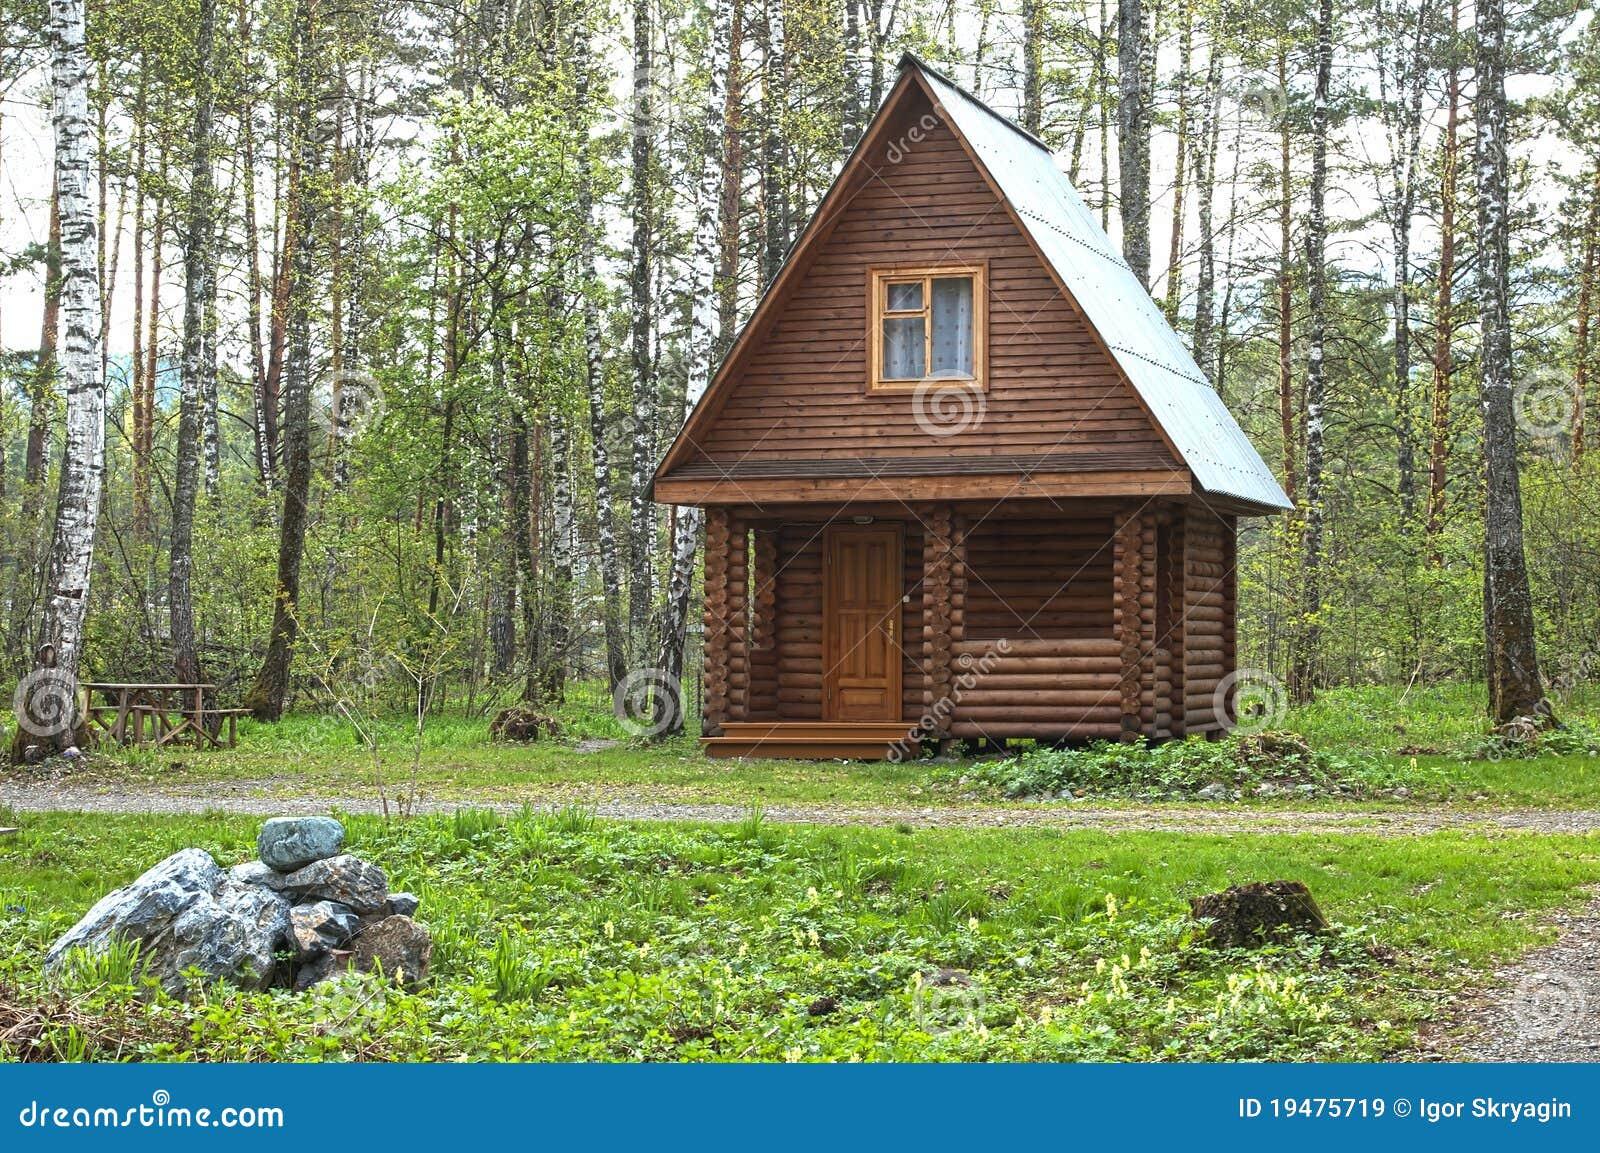 Peque a casa de madera en una madera - Casa pequena de madera ...